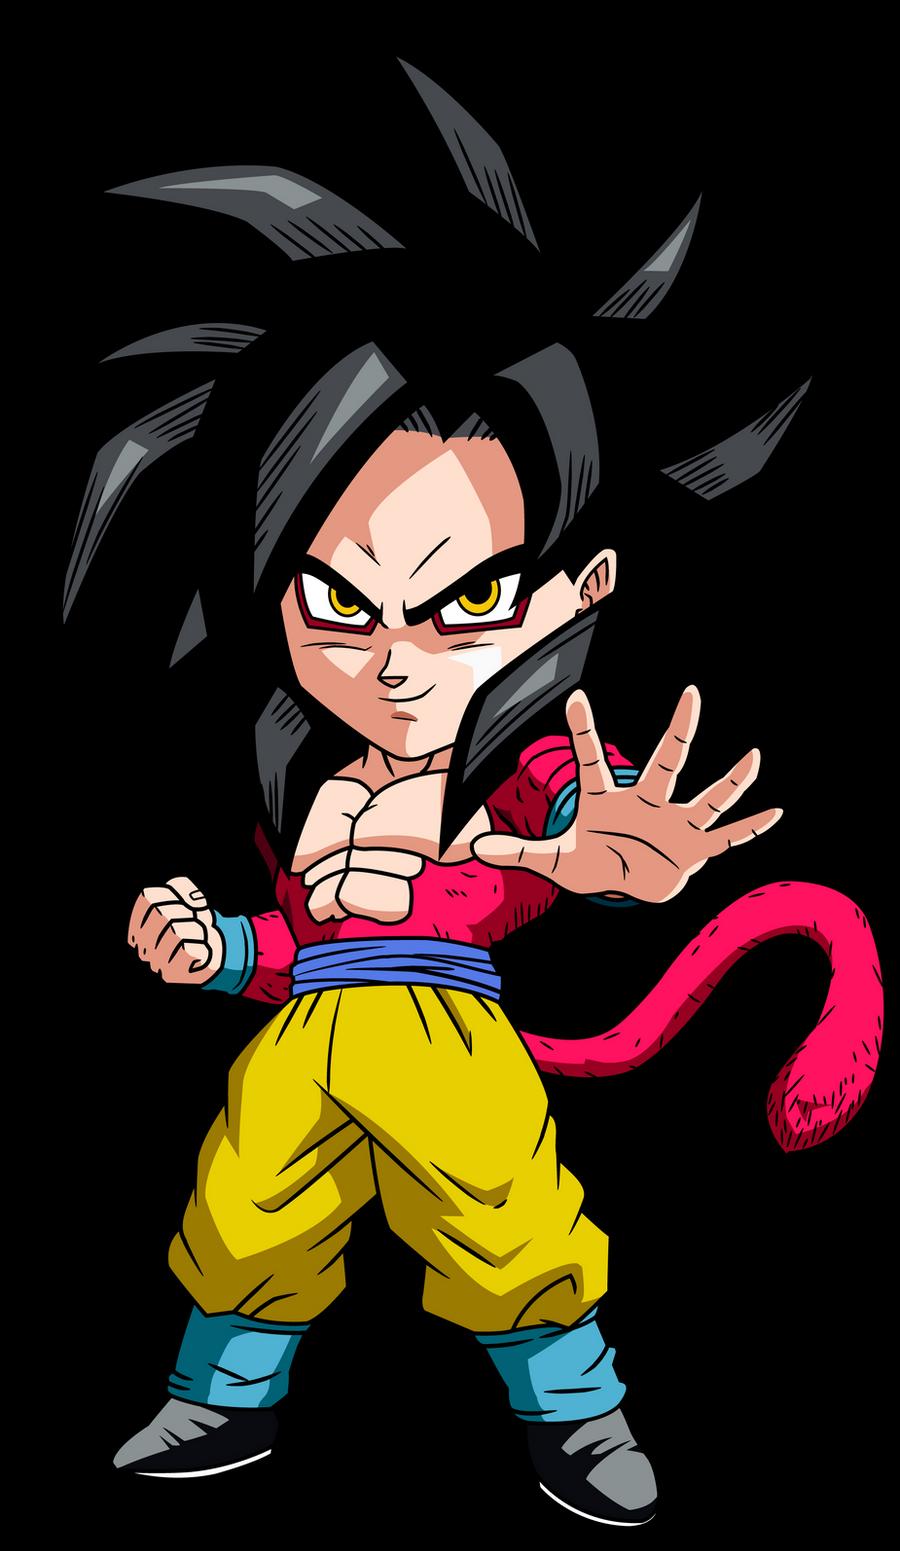 Anexo:Personajes de Dragon Ball - Wikipedia, la